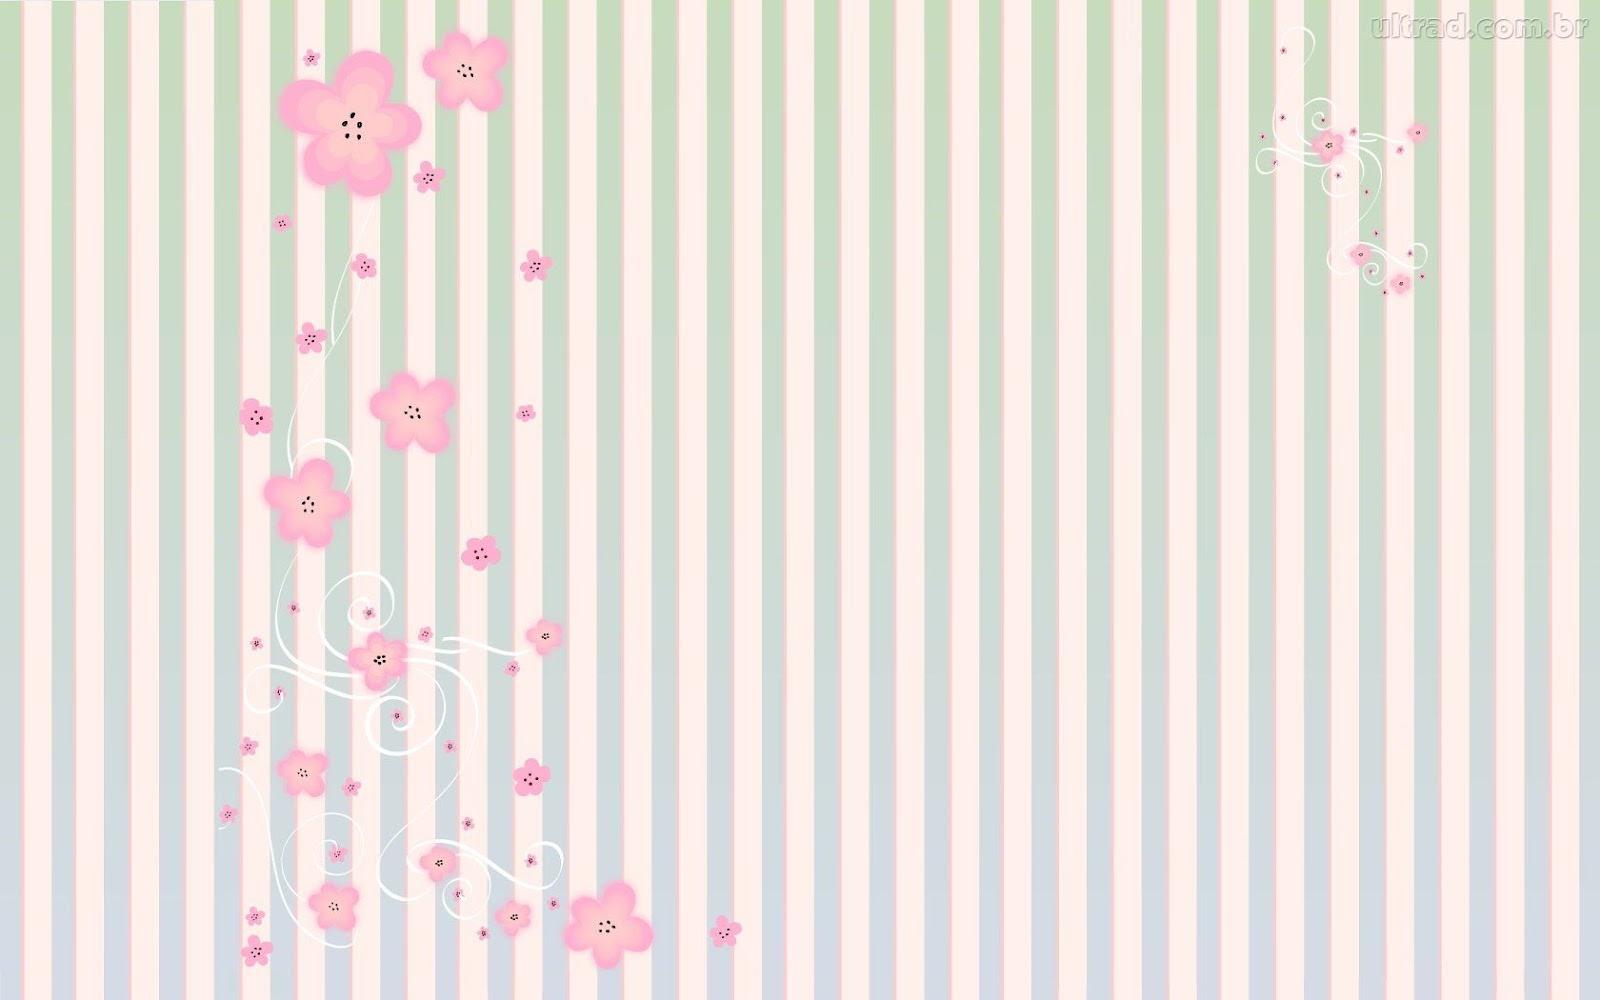 Flores de papel on pinterest tattoo design bild - Manualidades de papel ...